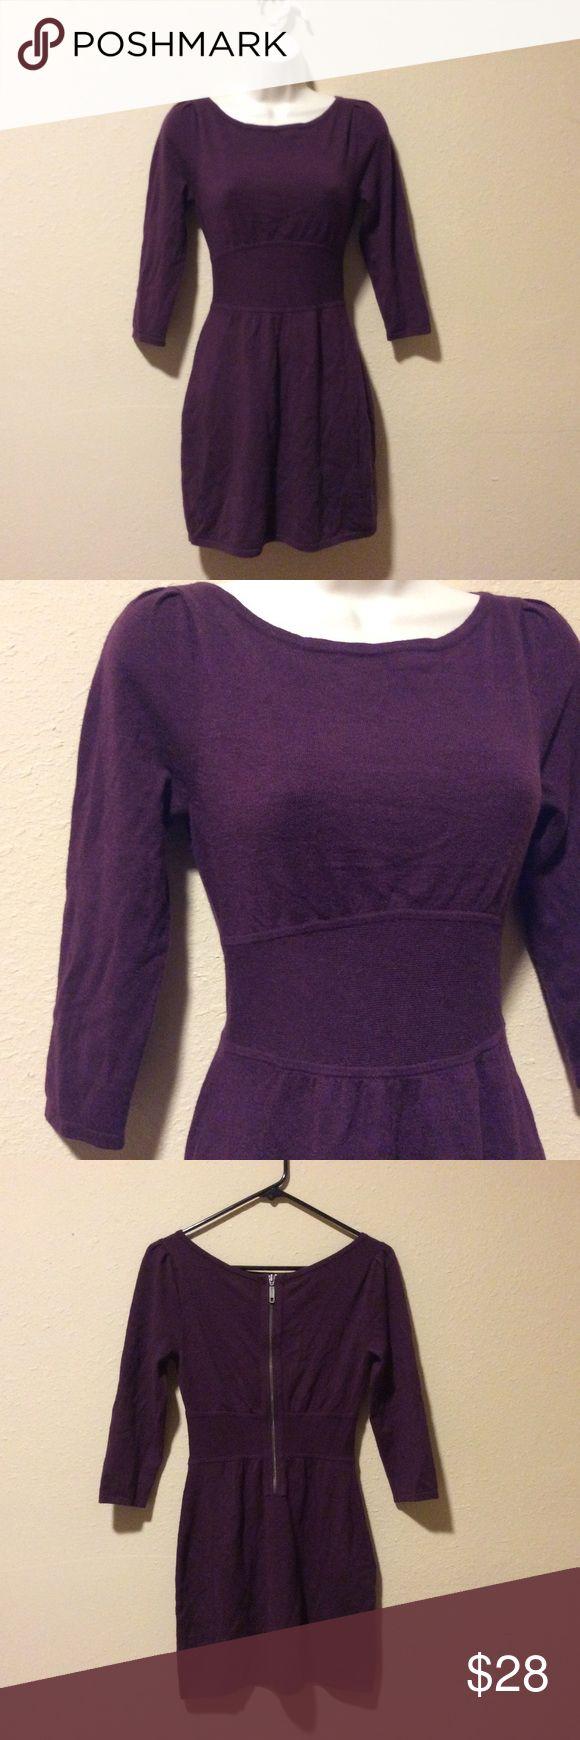 Express Burgundy Sweater Dress Express Burgundy Sweater Dress. No tags but never worn! Express Dresses Mini